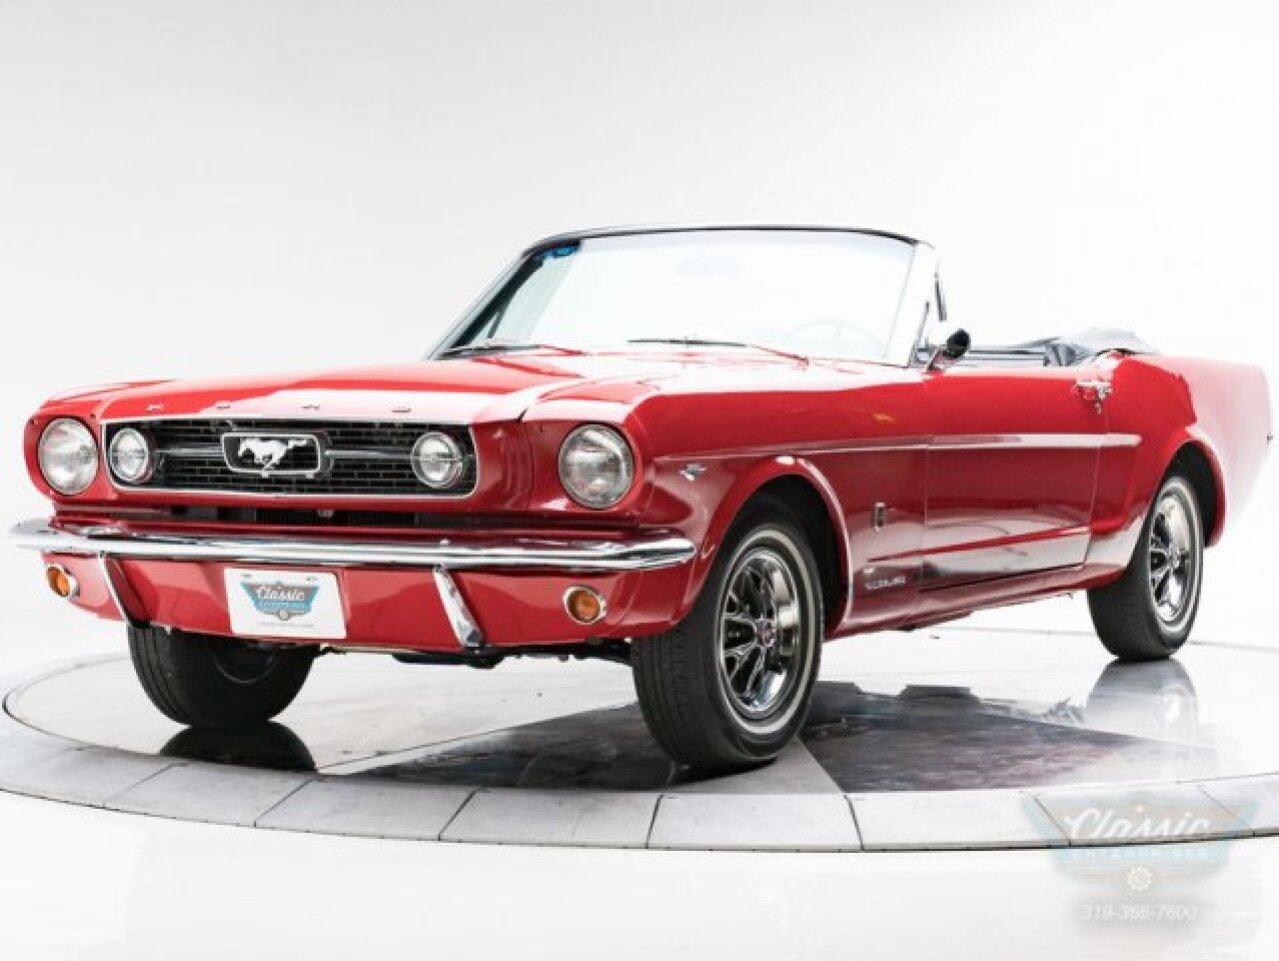 1966 Ford Mustang For Sale Near Cedar Rapids Iowa 52404 Classics